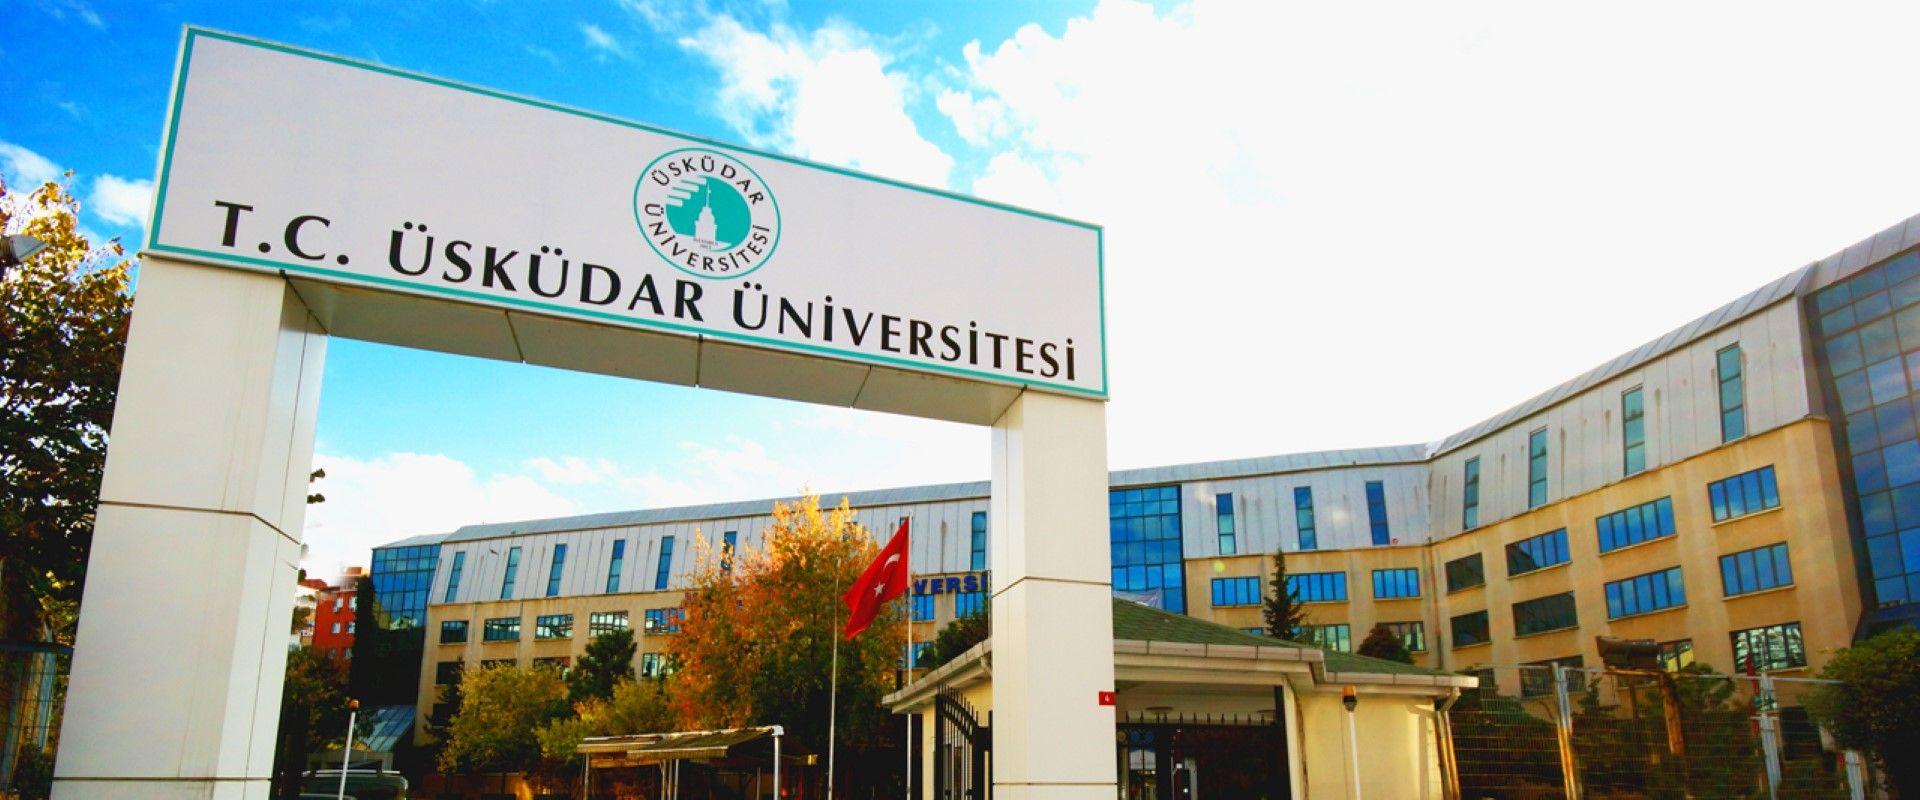 Read more about the article جامعة اسكودار تفتح آفاقًا جديدة في تركيا مع العام الدراسي 2020-2021